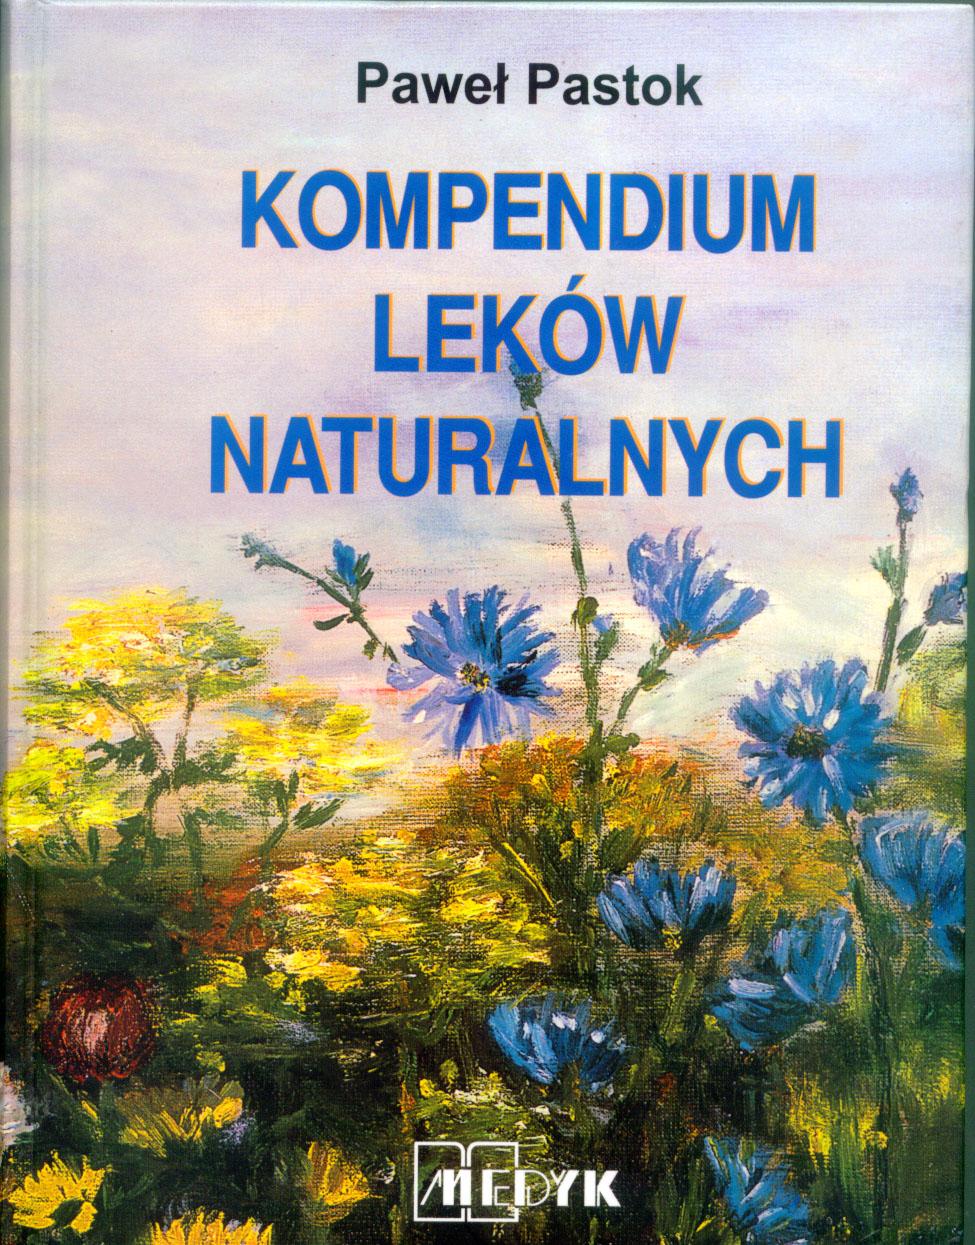 Kompendium Leków Nat.